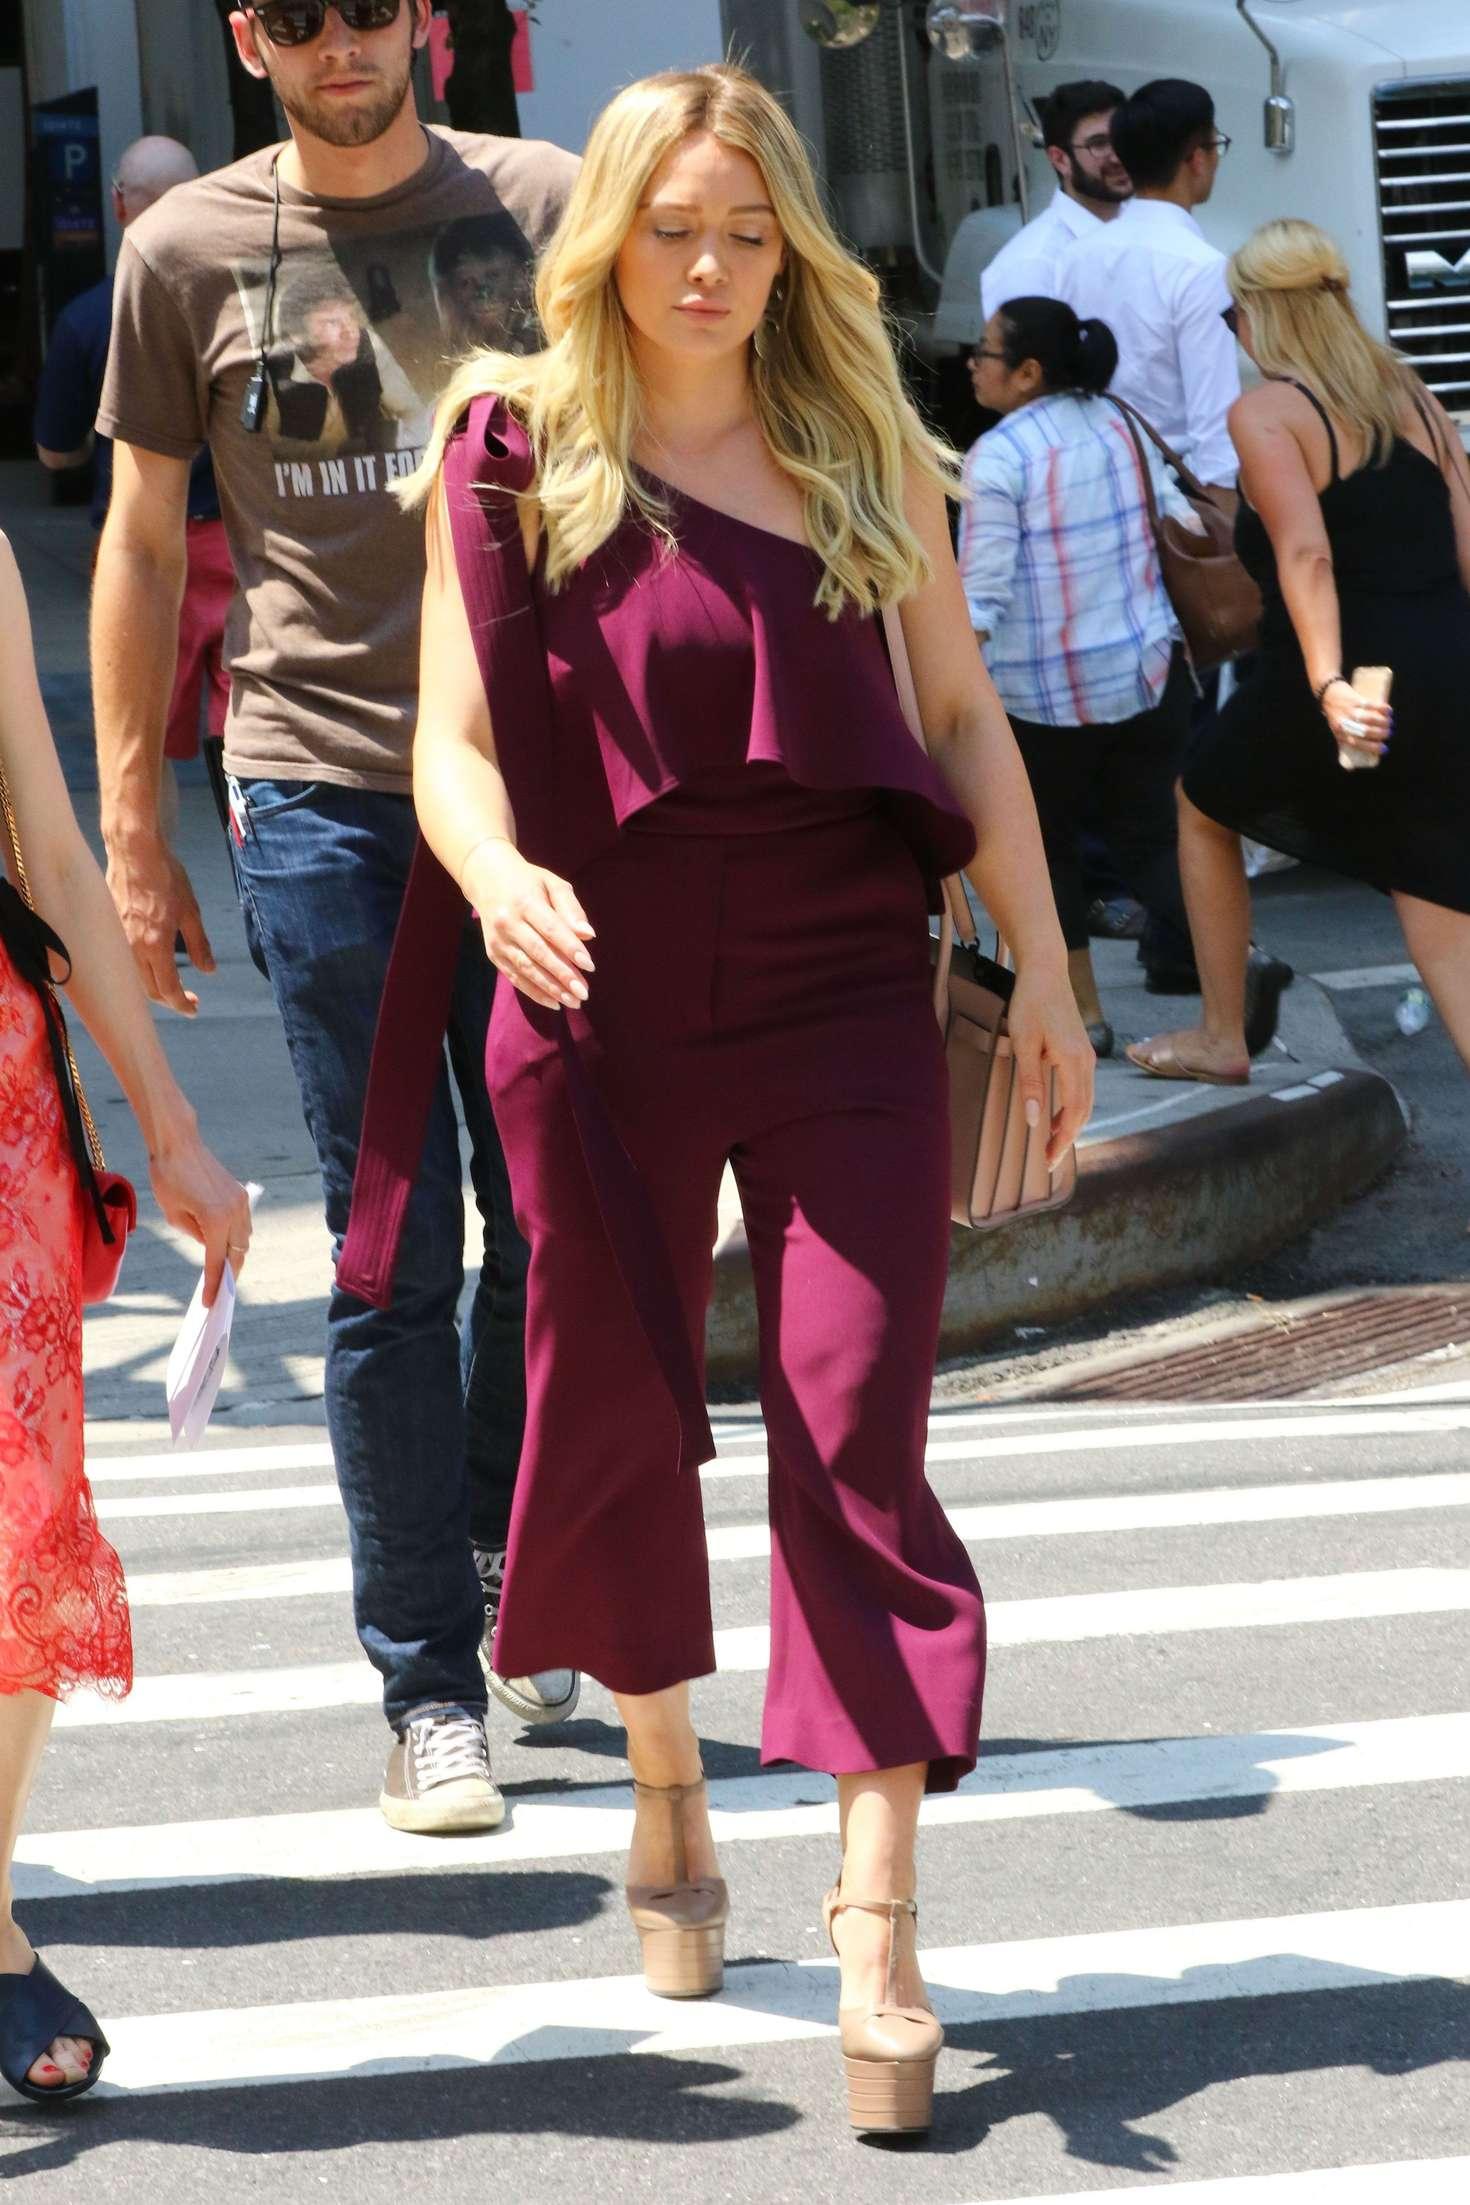 Hilary Duff 2017 : Hilary Duff on Younger Set -09